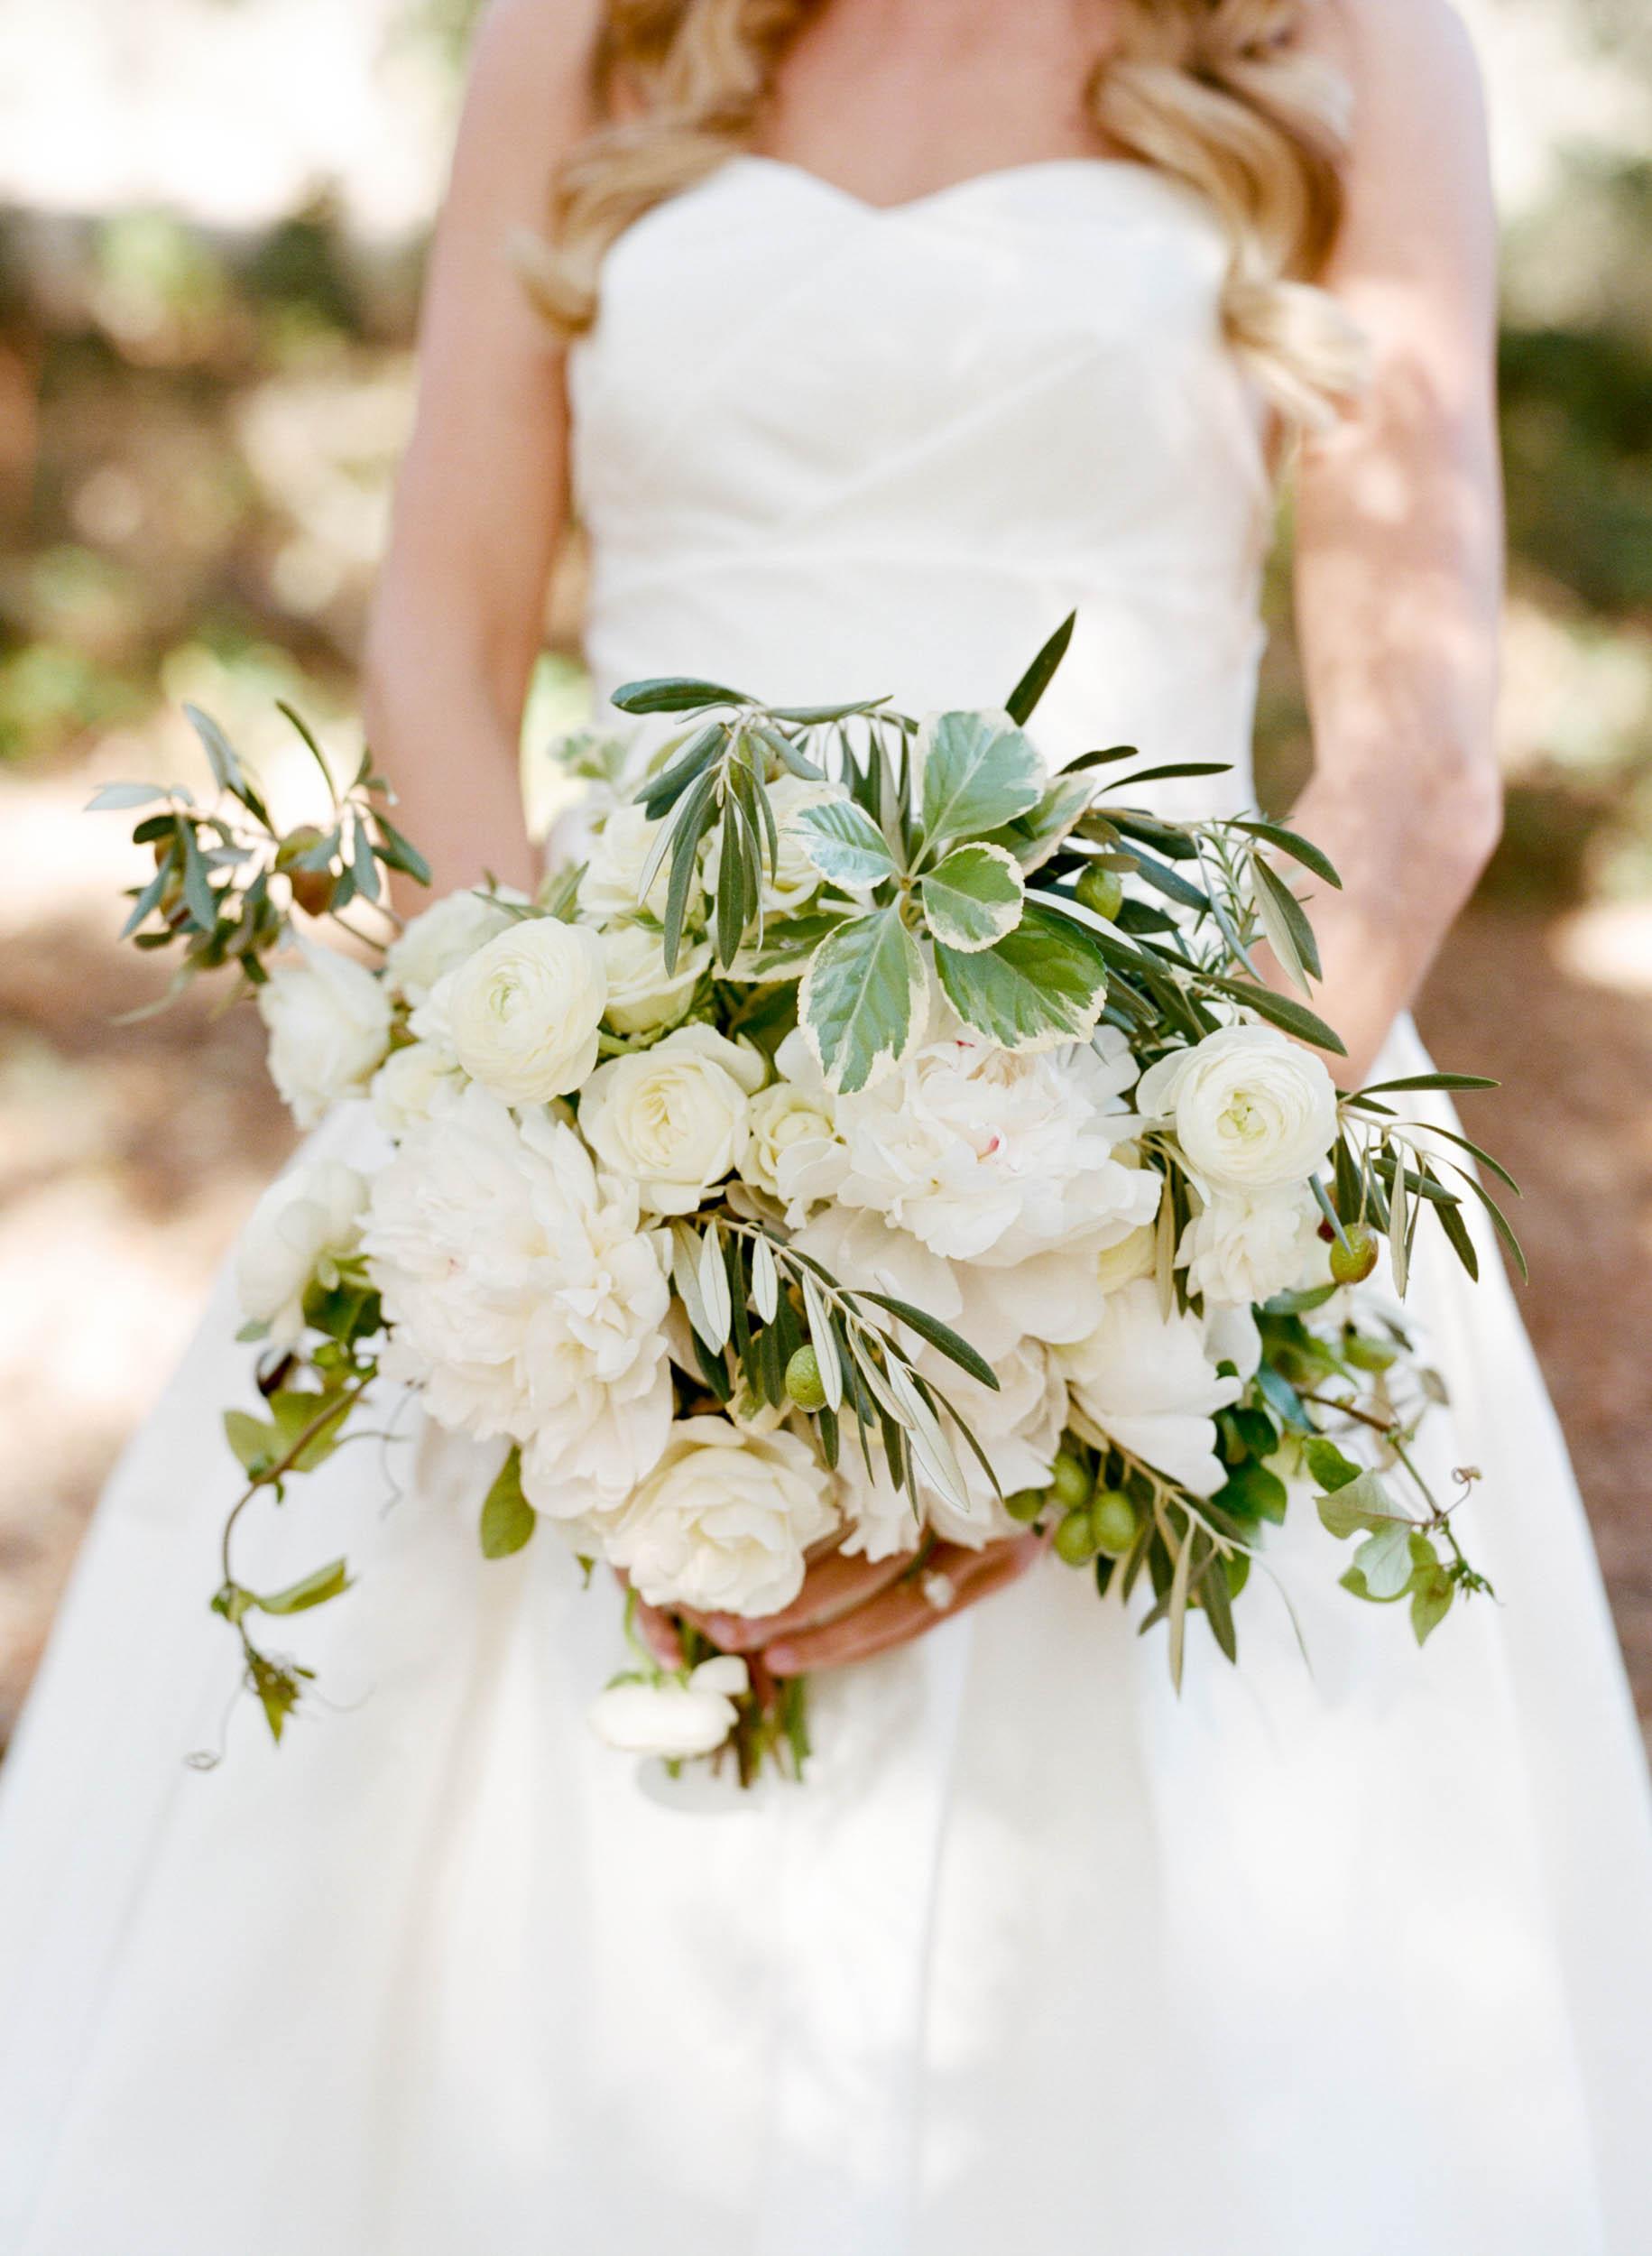 SylvieGil-Durham-Ranch-Organic-Ethereal-Rustic-Olive-Bouquet-Wedding